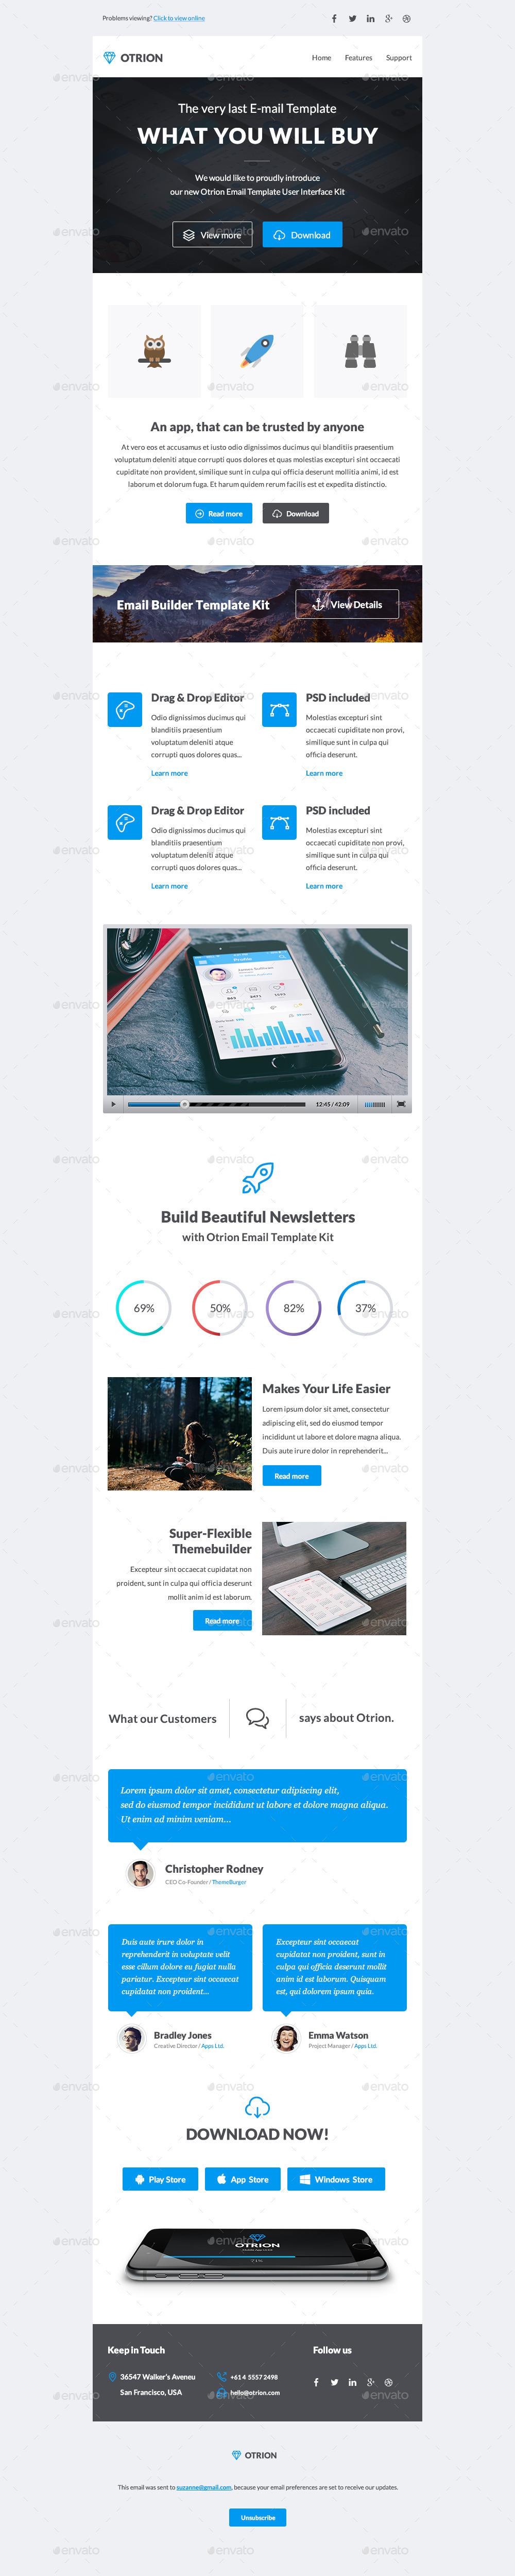 otrion e mail template builder by megyunkborabora graphicriver. Black Bedroom Furniture Sets. Home Design Ideas